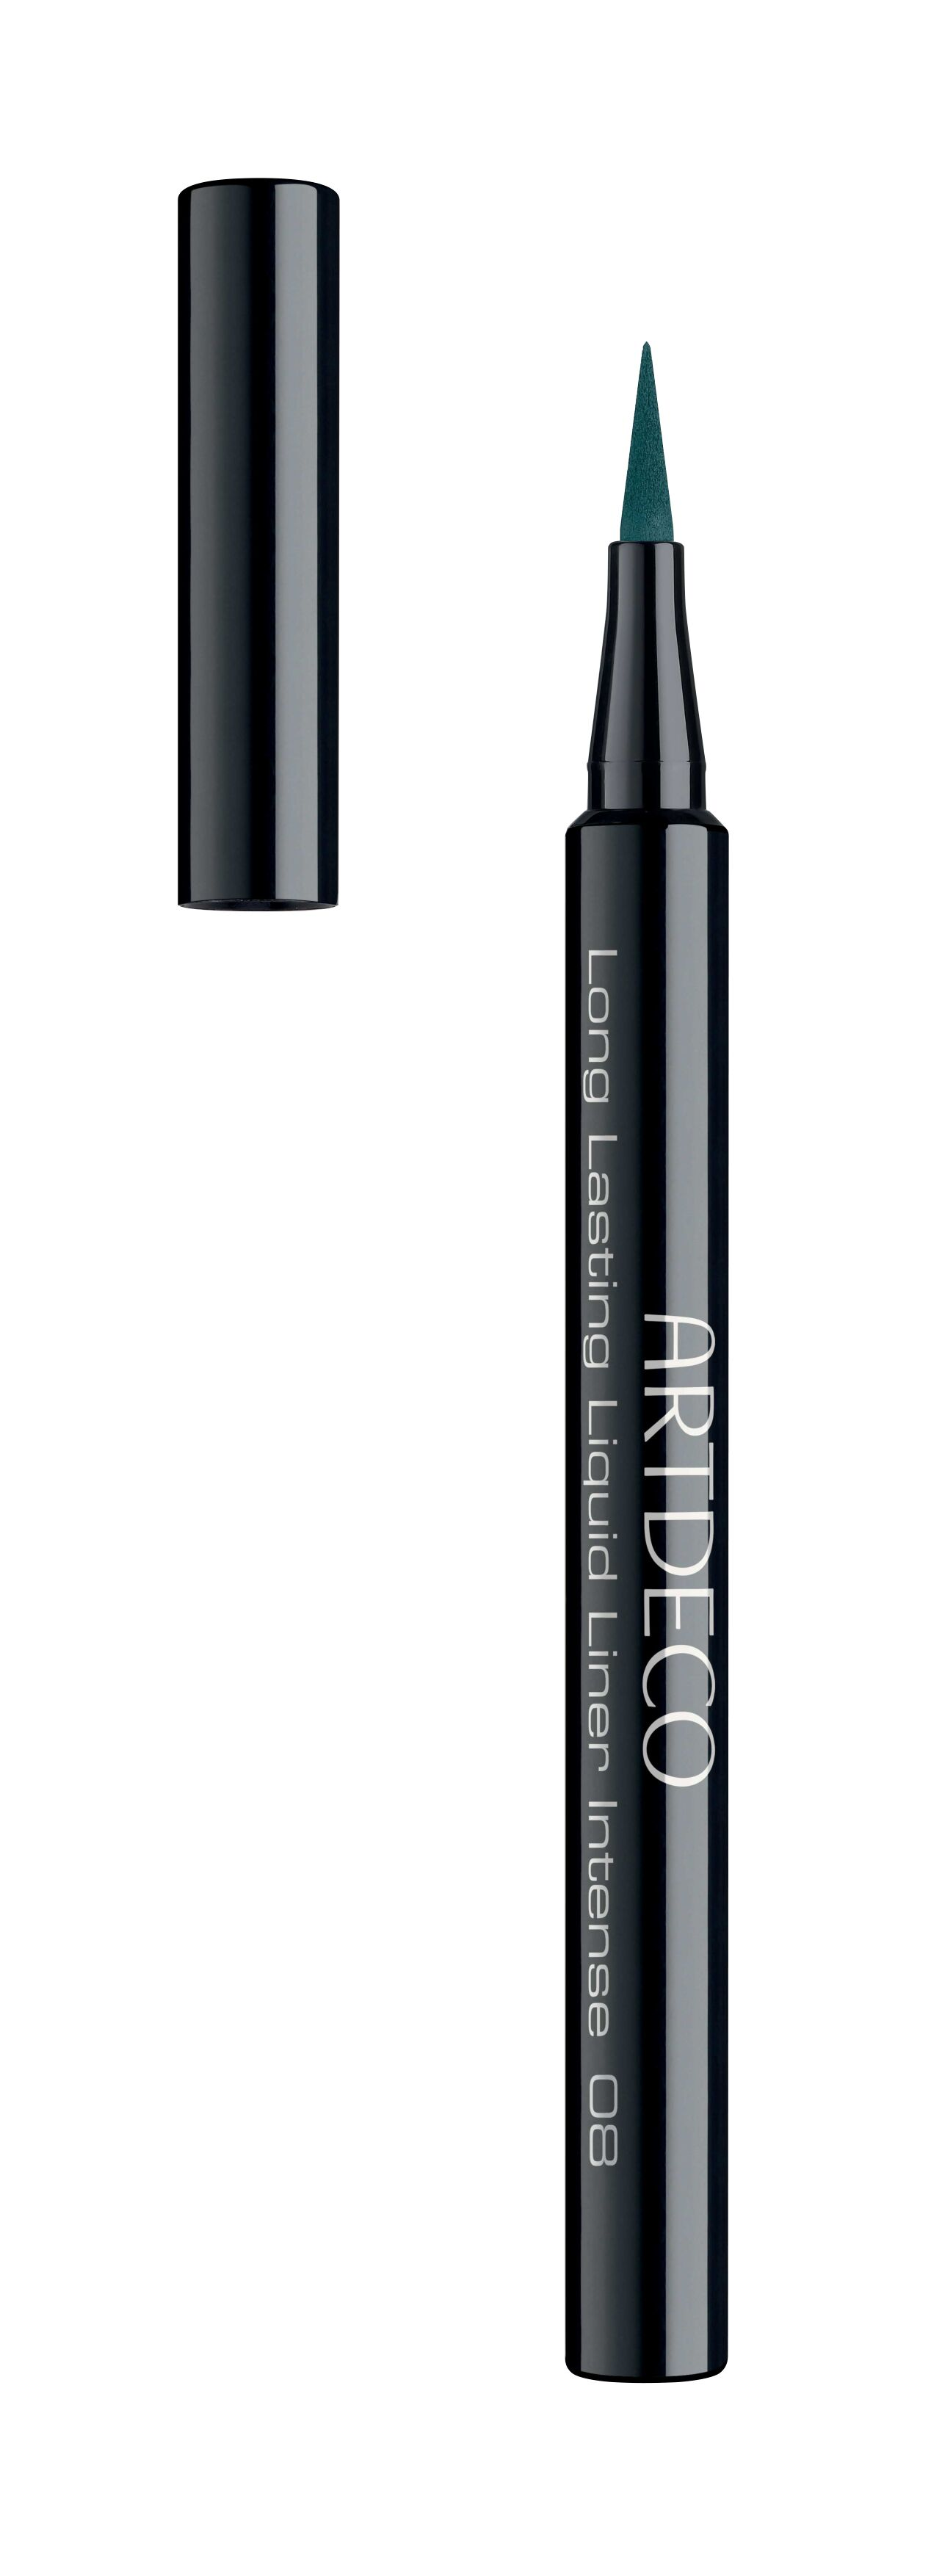 Artdeco Intense Liquid Liner Long-Lasting